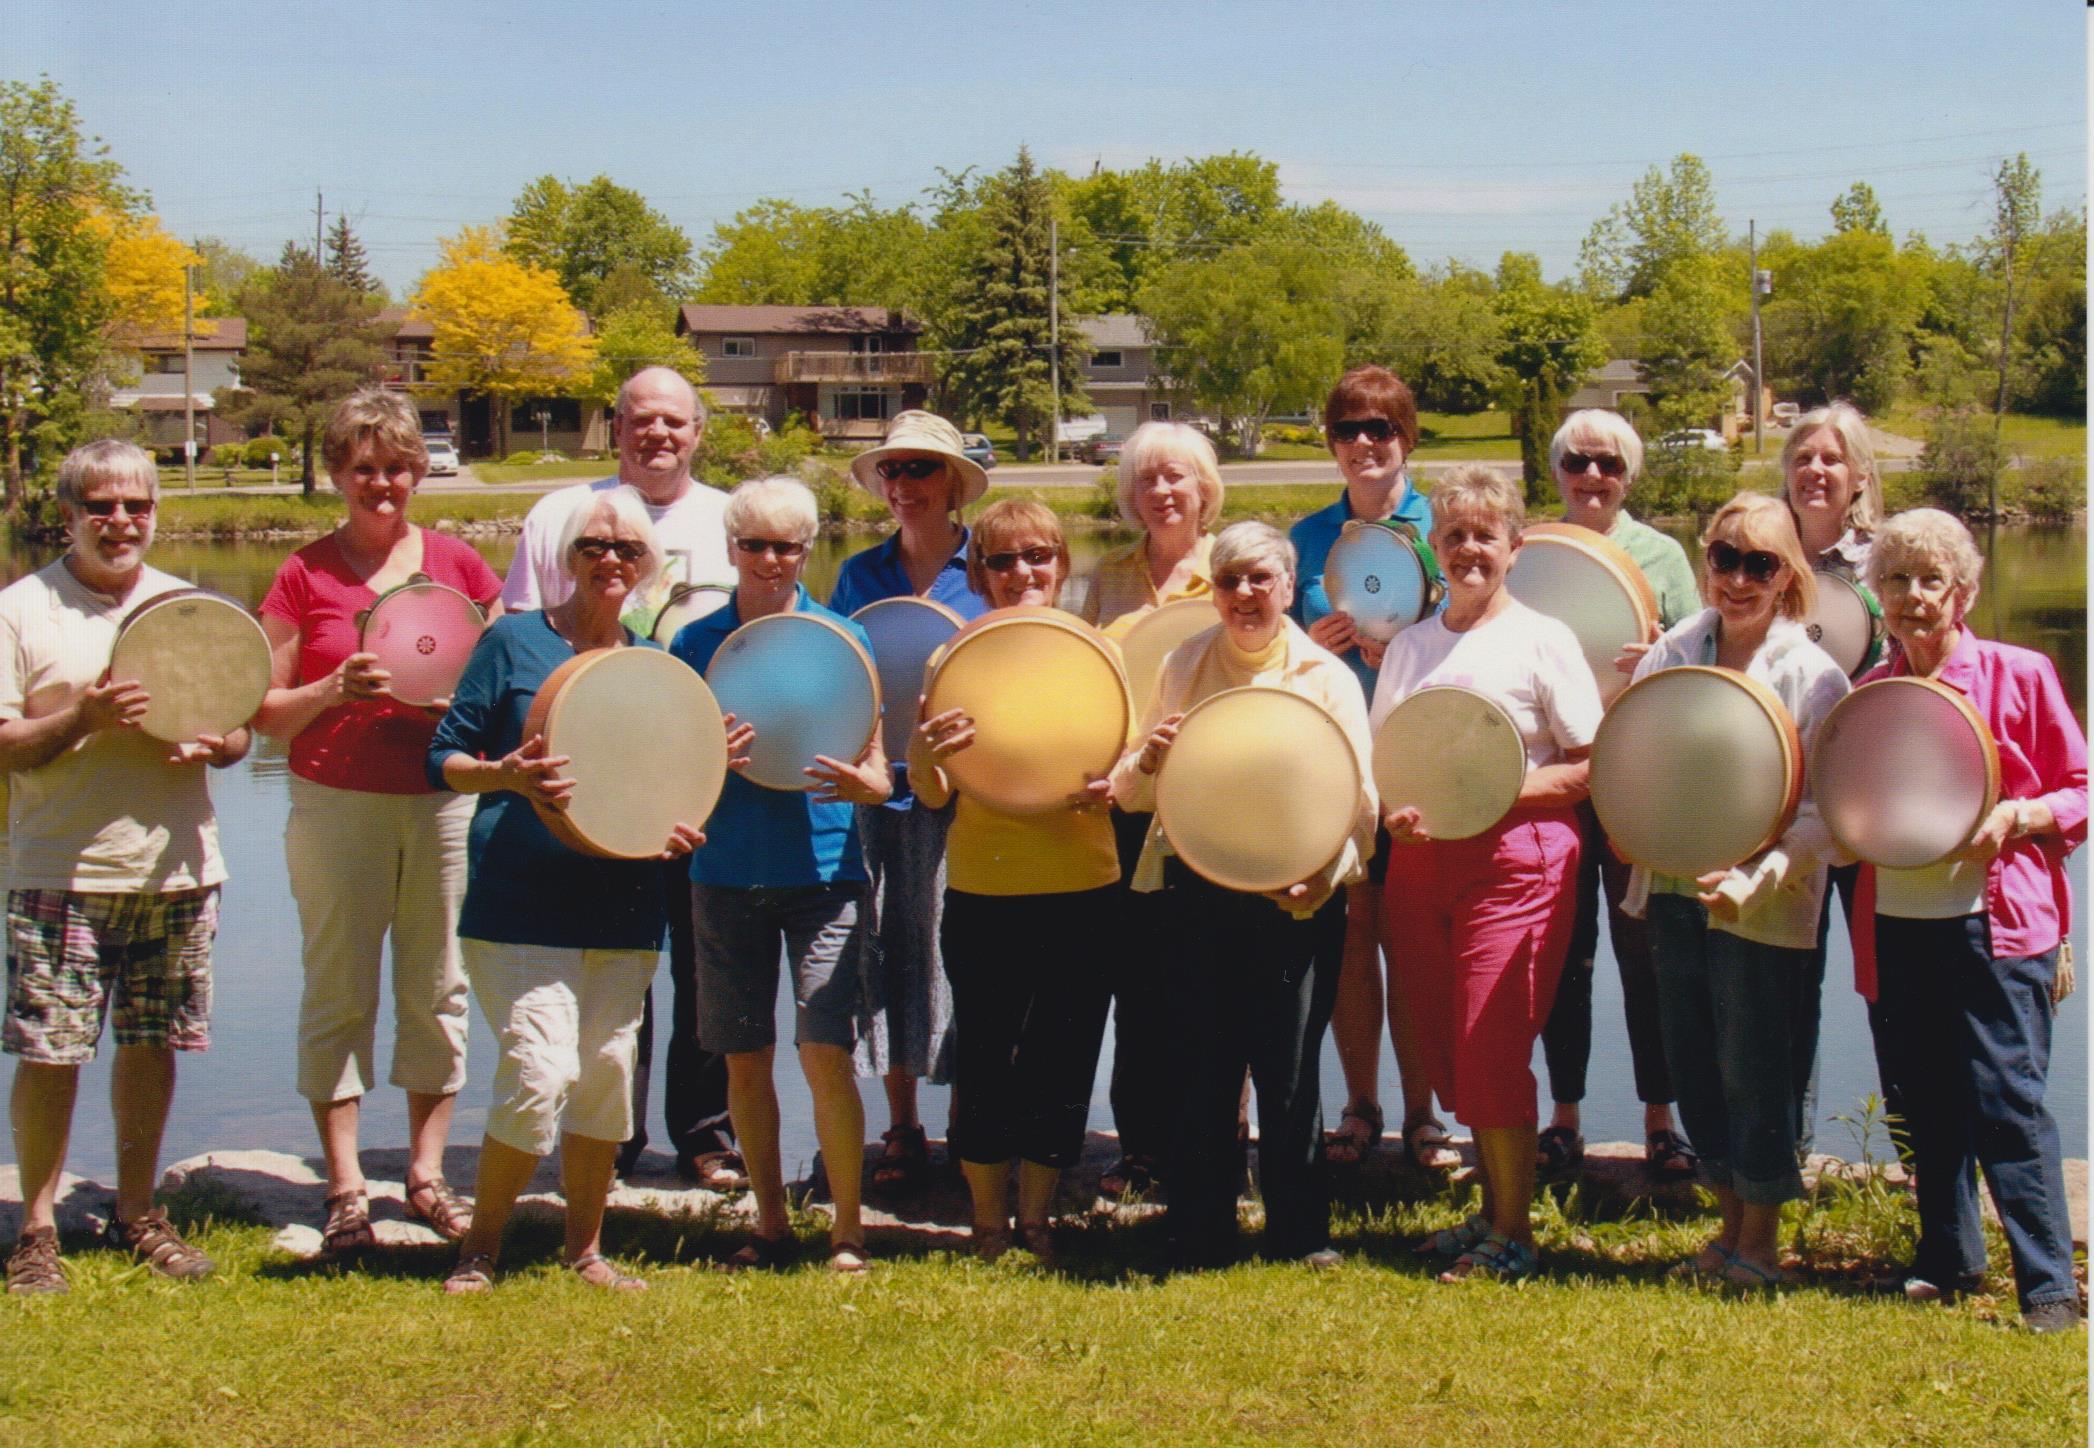 Summer picnic, Mark Street United Church drummers